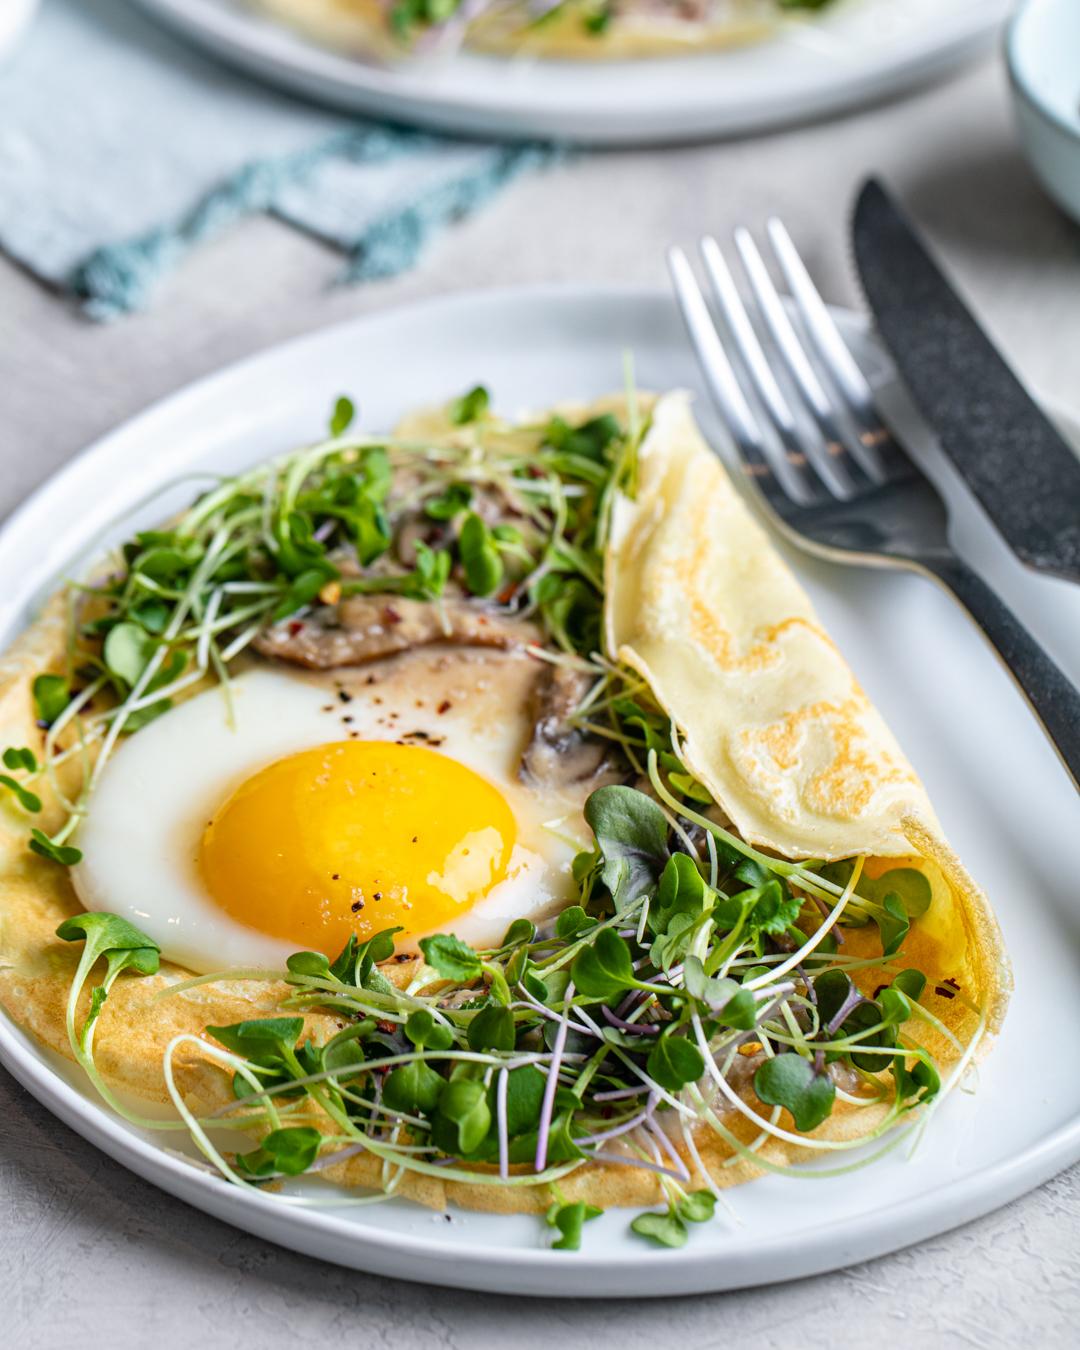 Mushroom & Egg Savory Crêpes